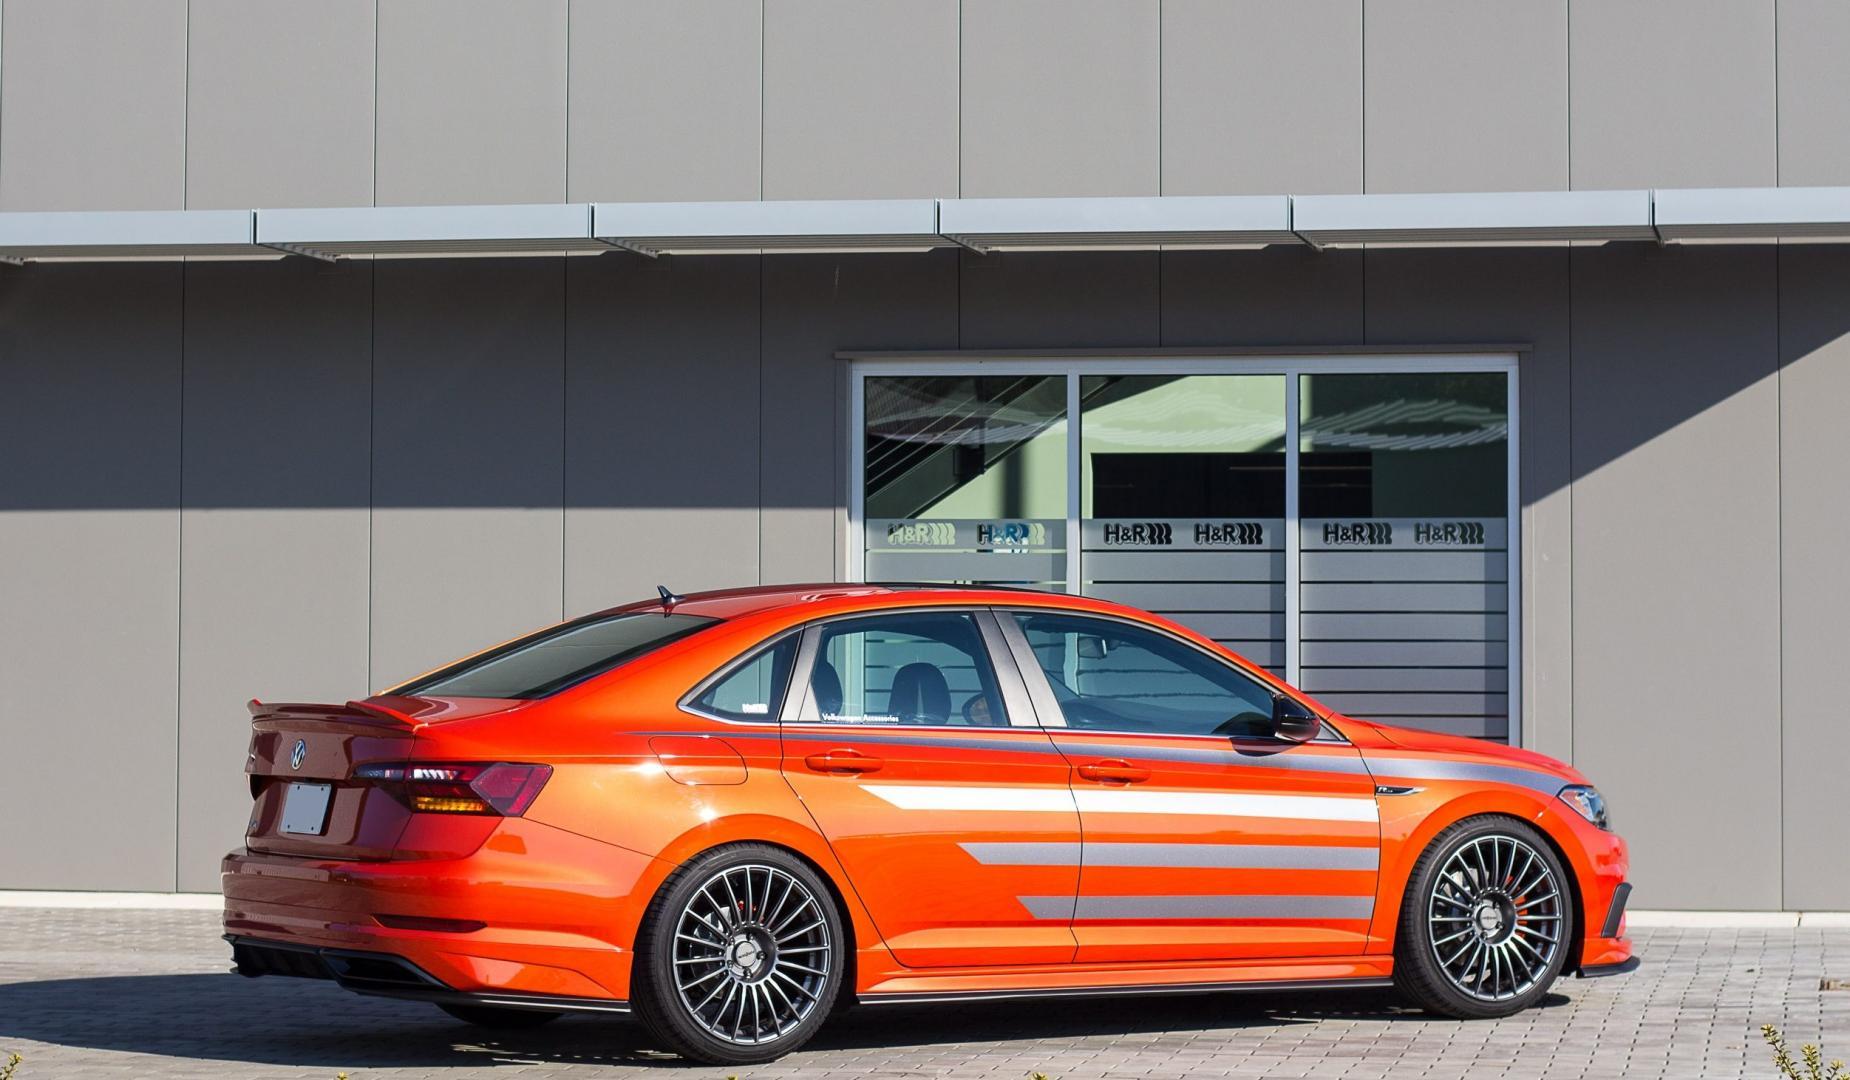 Volkswagen Jetta HR springs